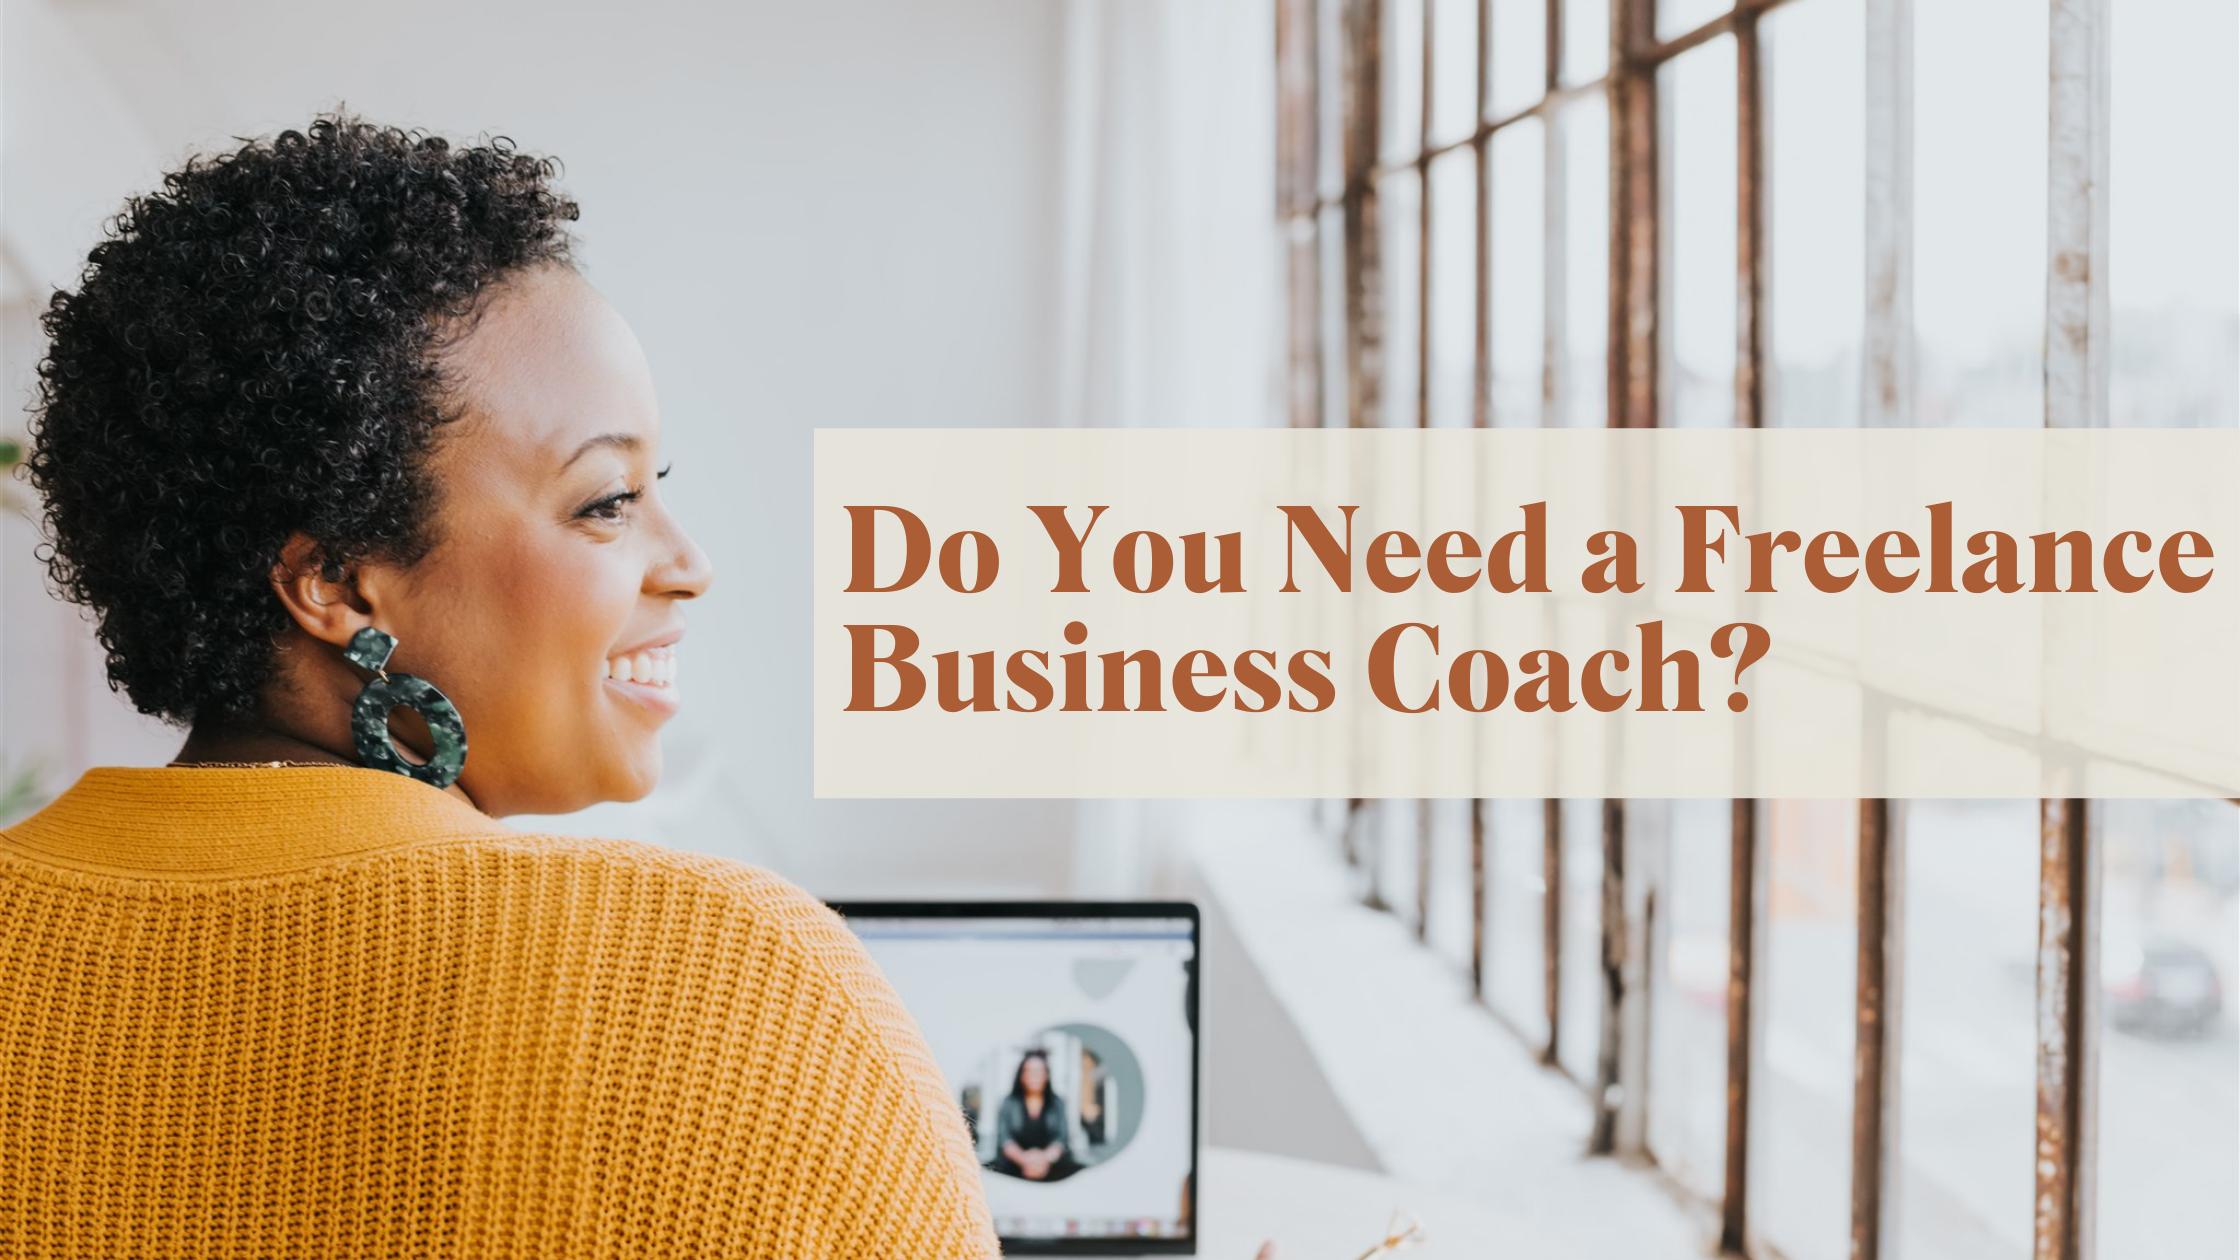 Do You Need a Freelance Business Coach?